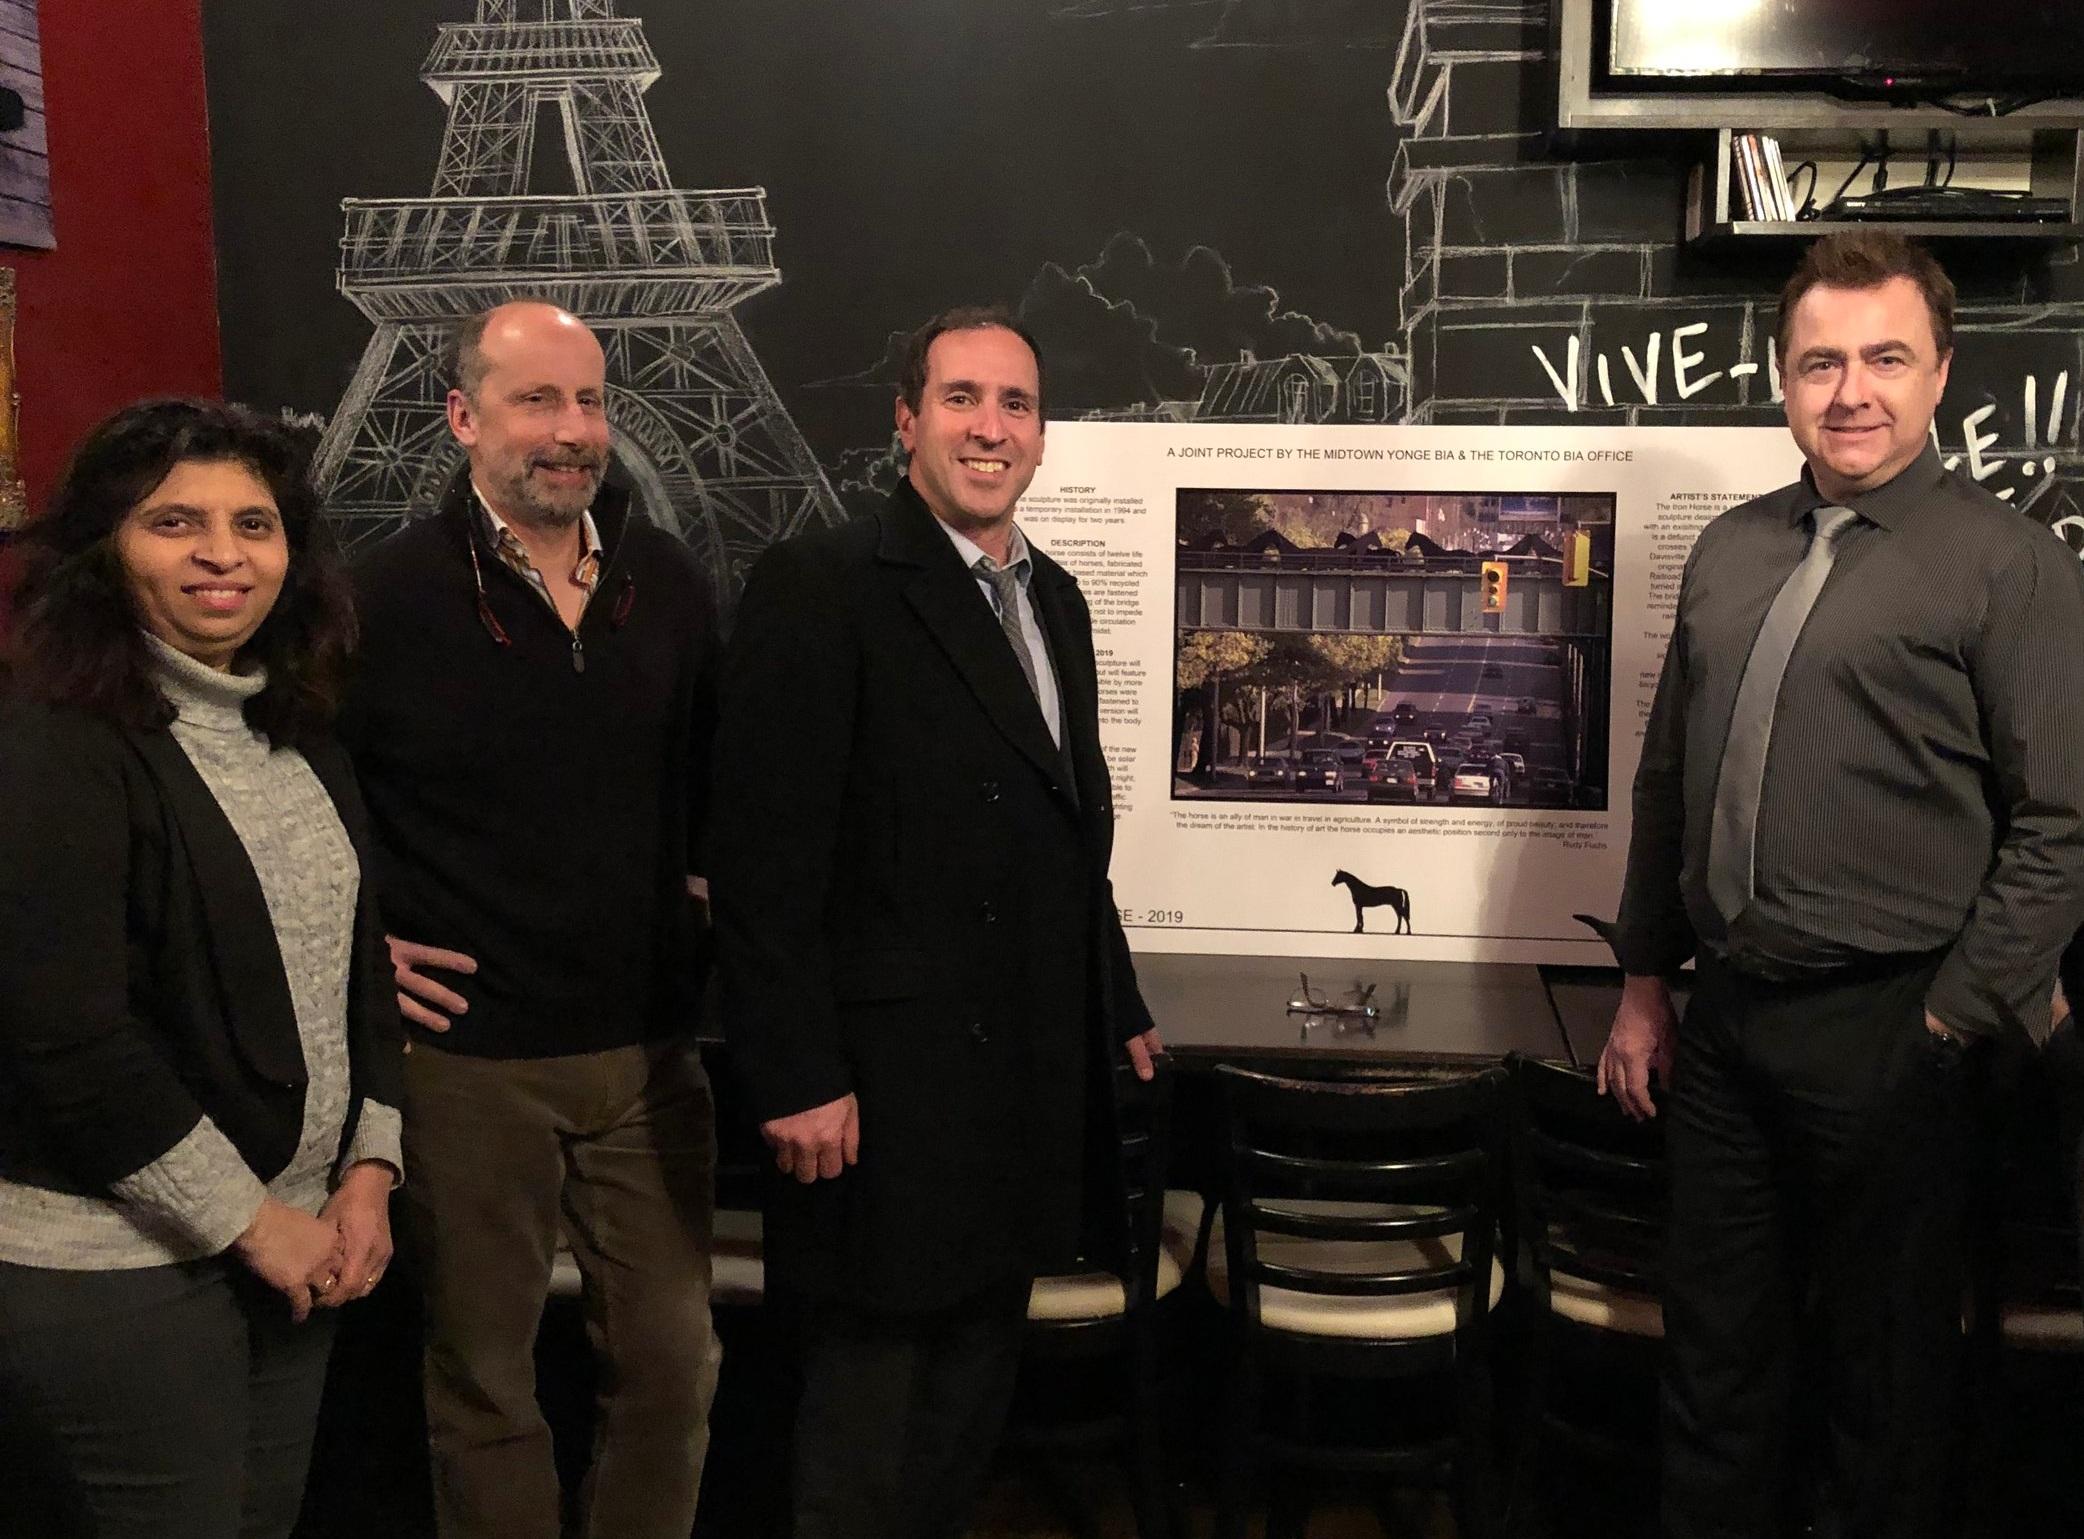 Raj Kumar (City of Toronto), Robert Sprachman (Artist), Josh Matlow (City Councillor for Toronto-St. Paul's), and Andrew Flint (Executive Director, Midtown Yonge BIA)